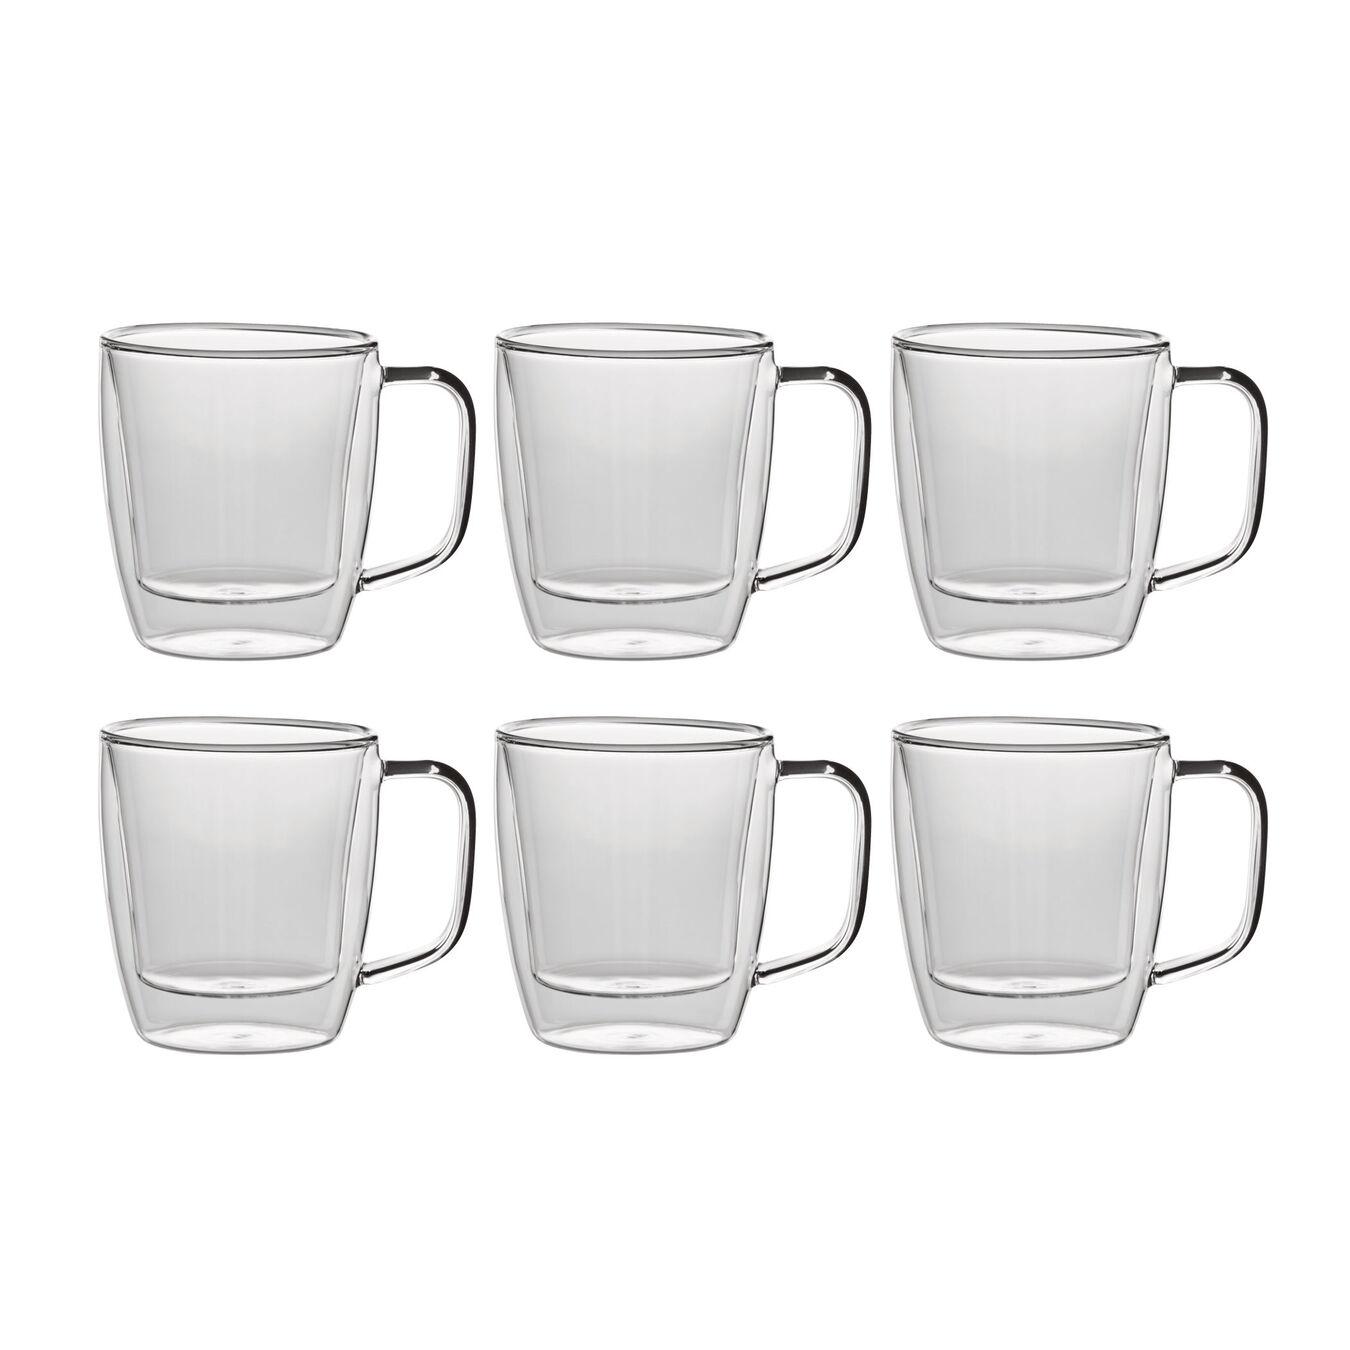 6 Piece Double-Wall Coffee Mug Set,,large 1